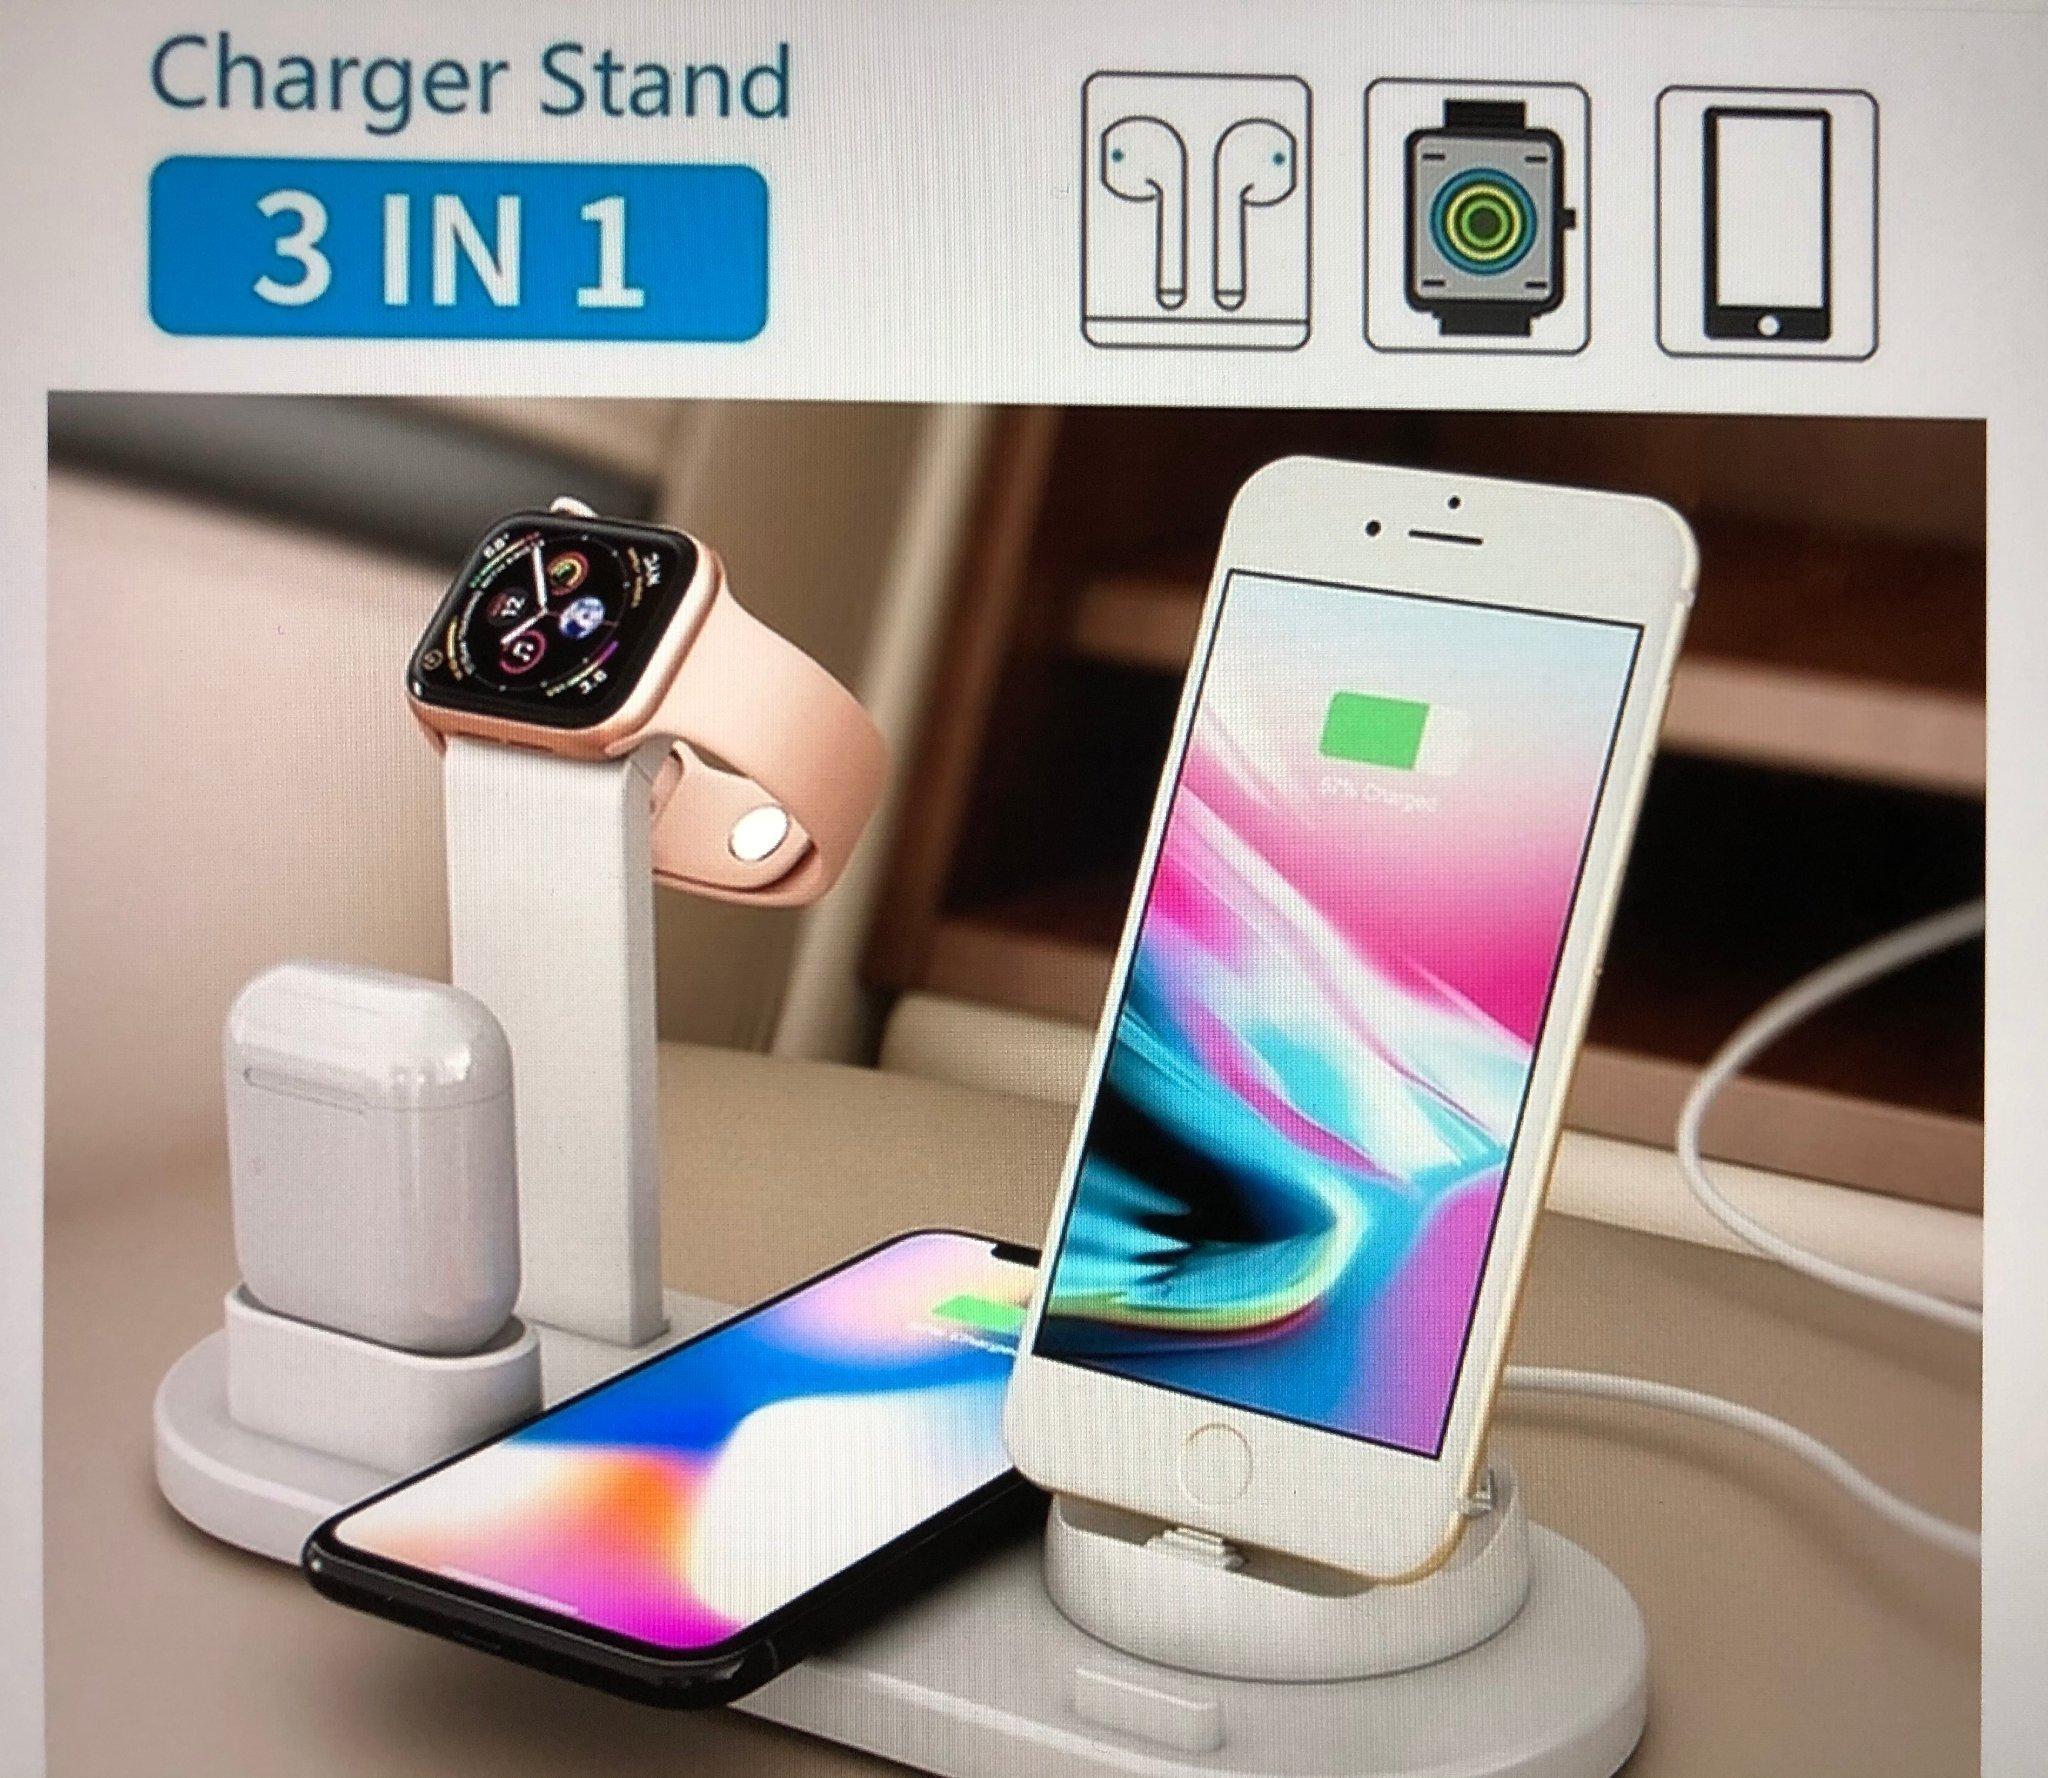 Laddare 3i1 till iPhone 44S